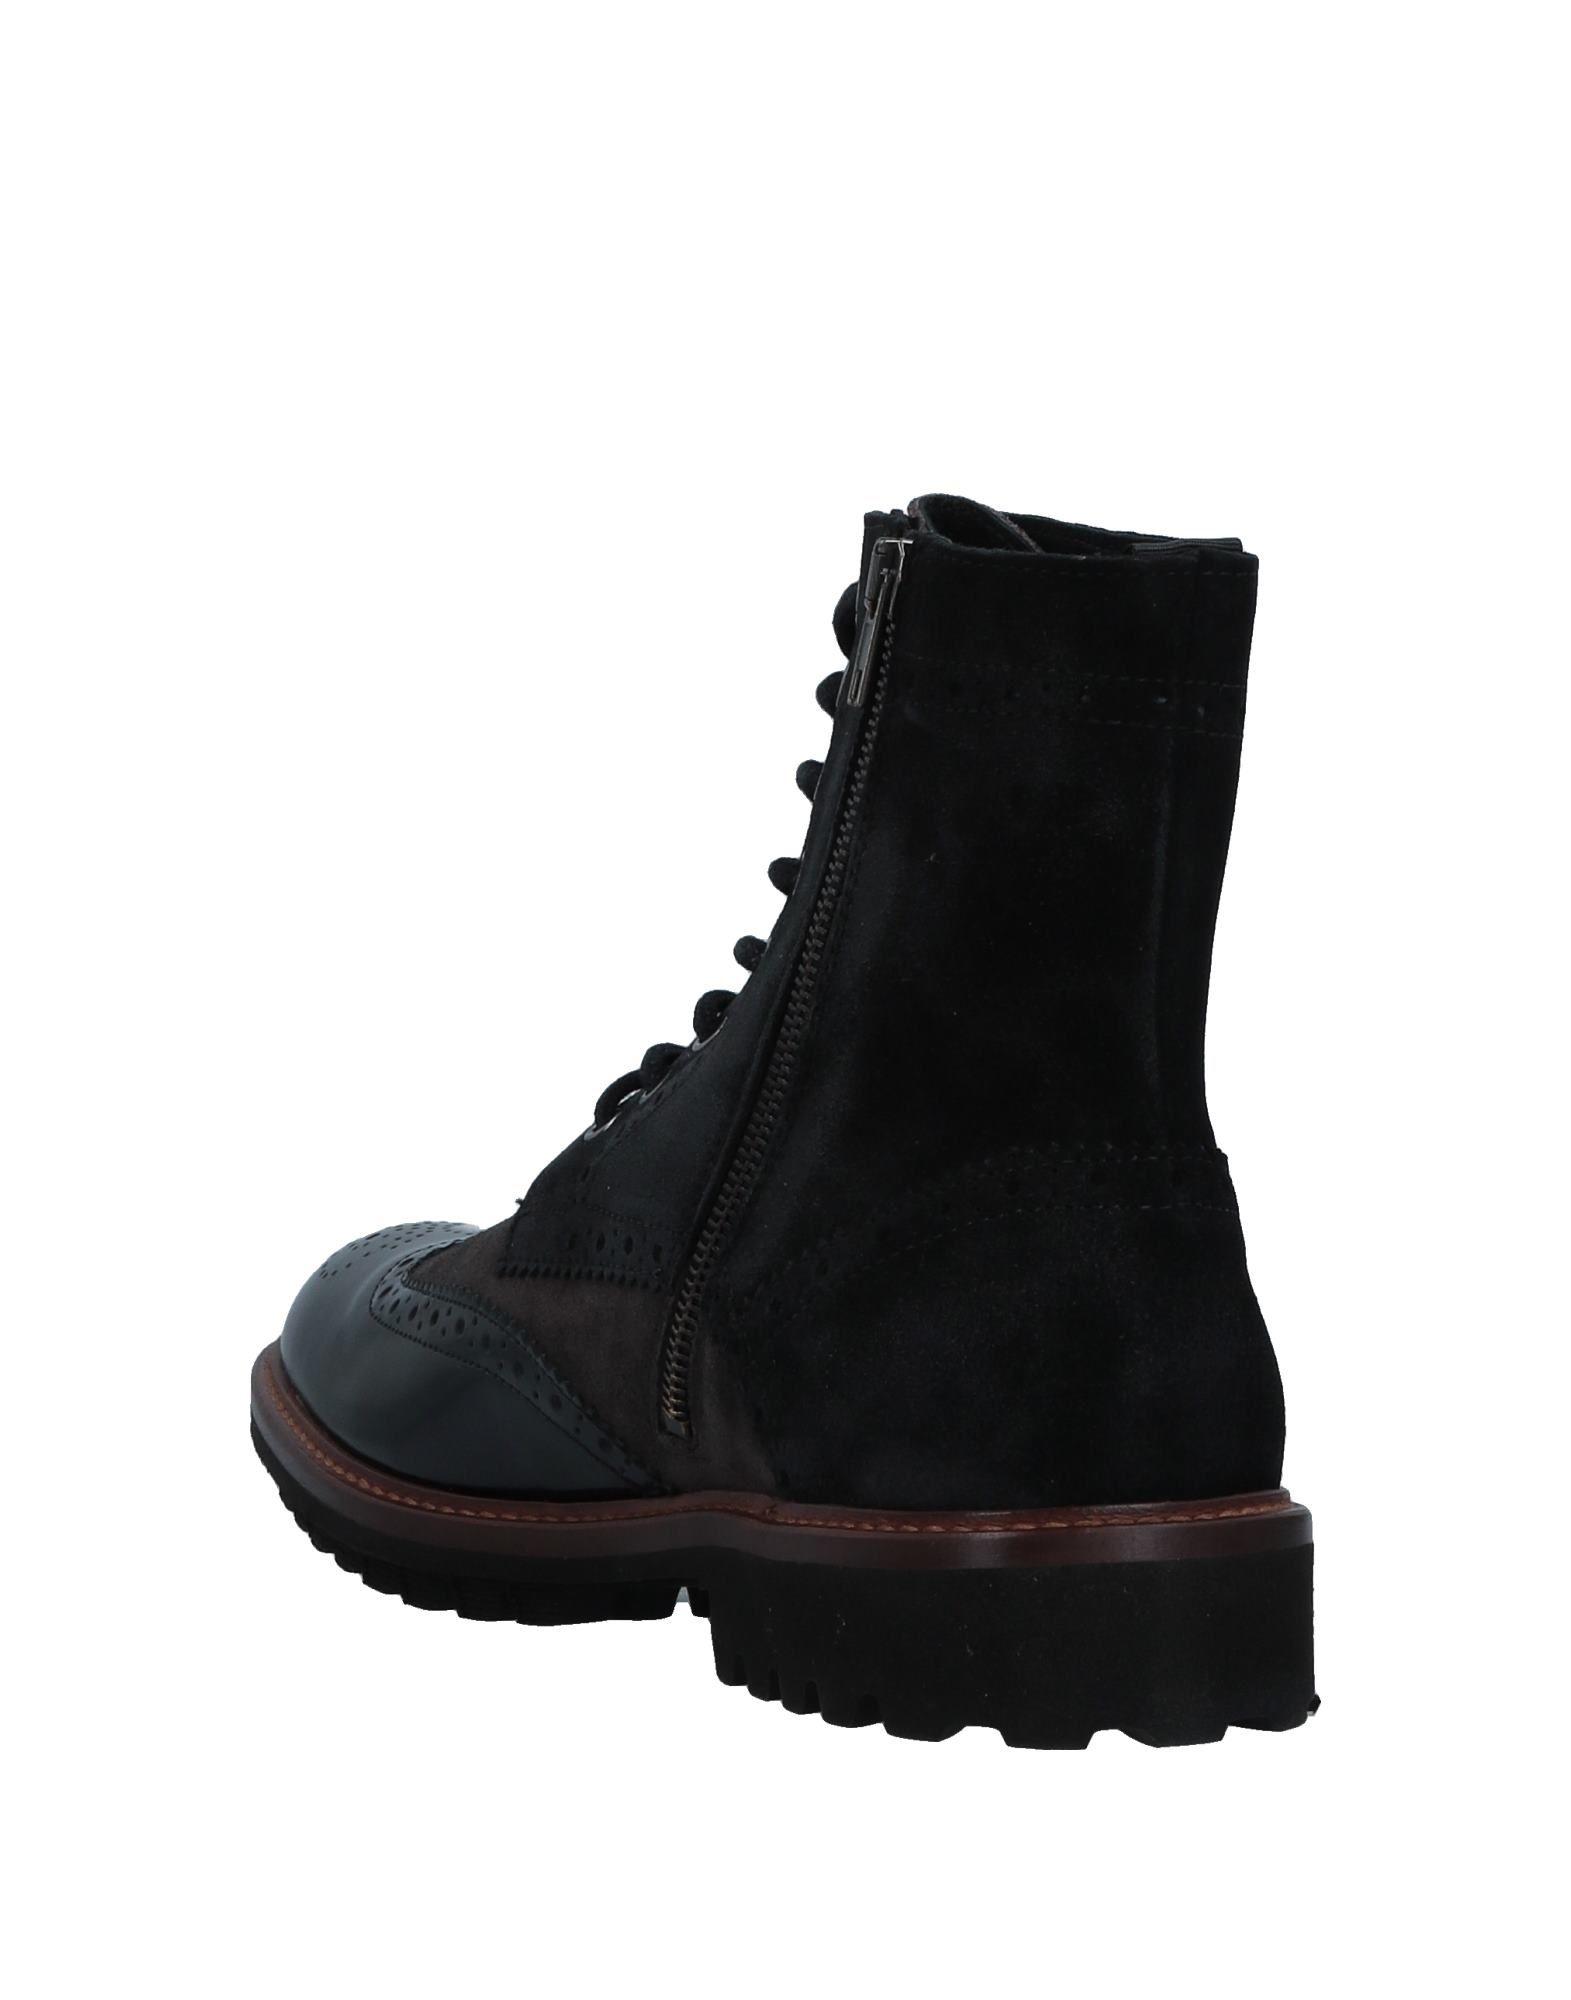 Rabatt Stiefelette echte Schuhe Trussardi Jeans Stiefelette Rabatt Herren  11516163KR 5c7ef1